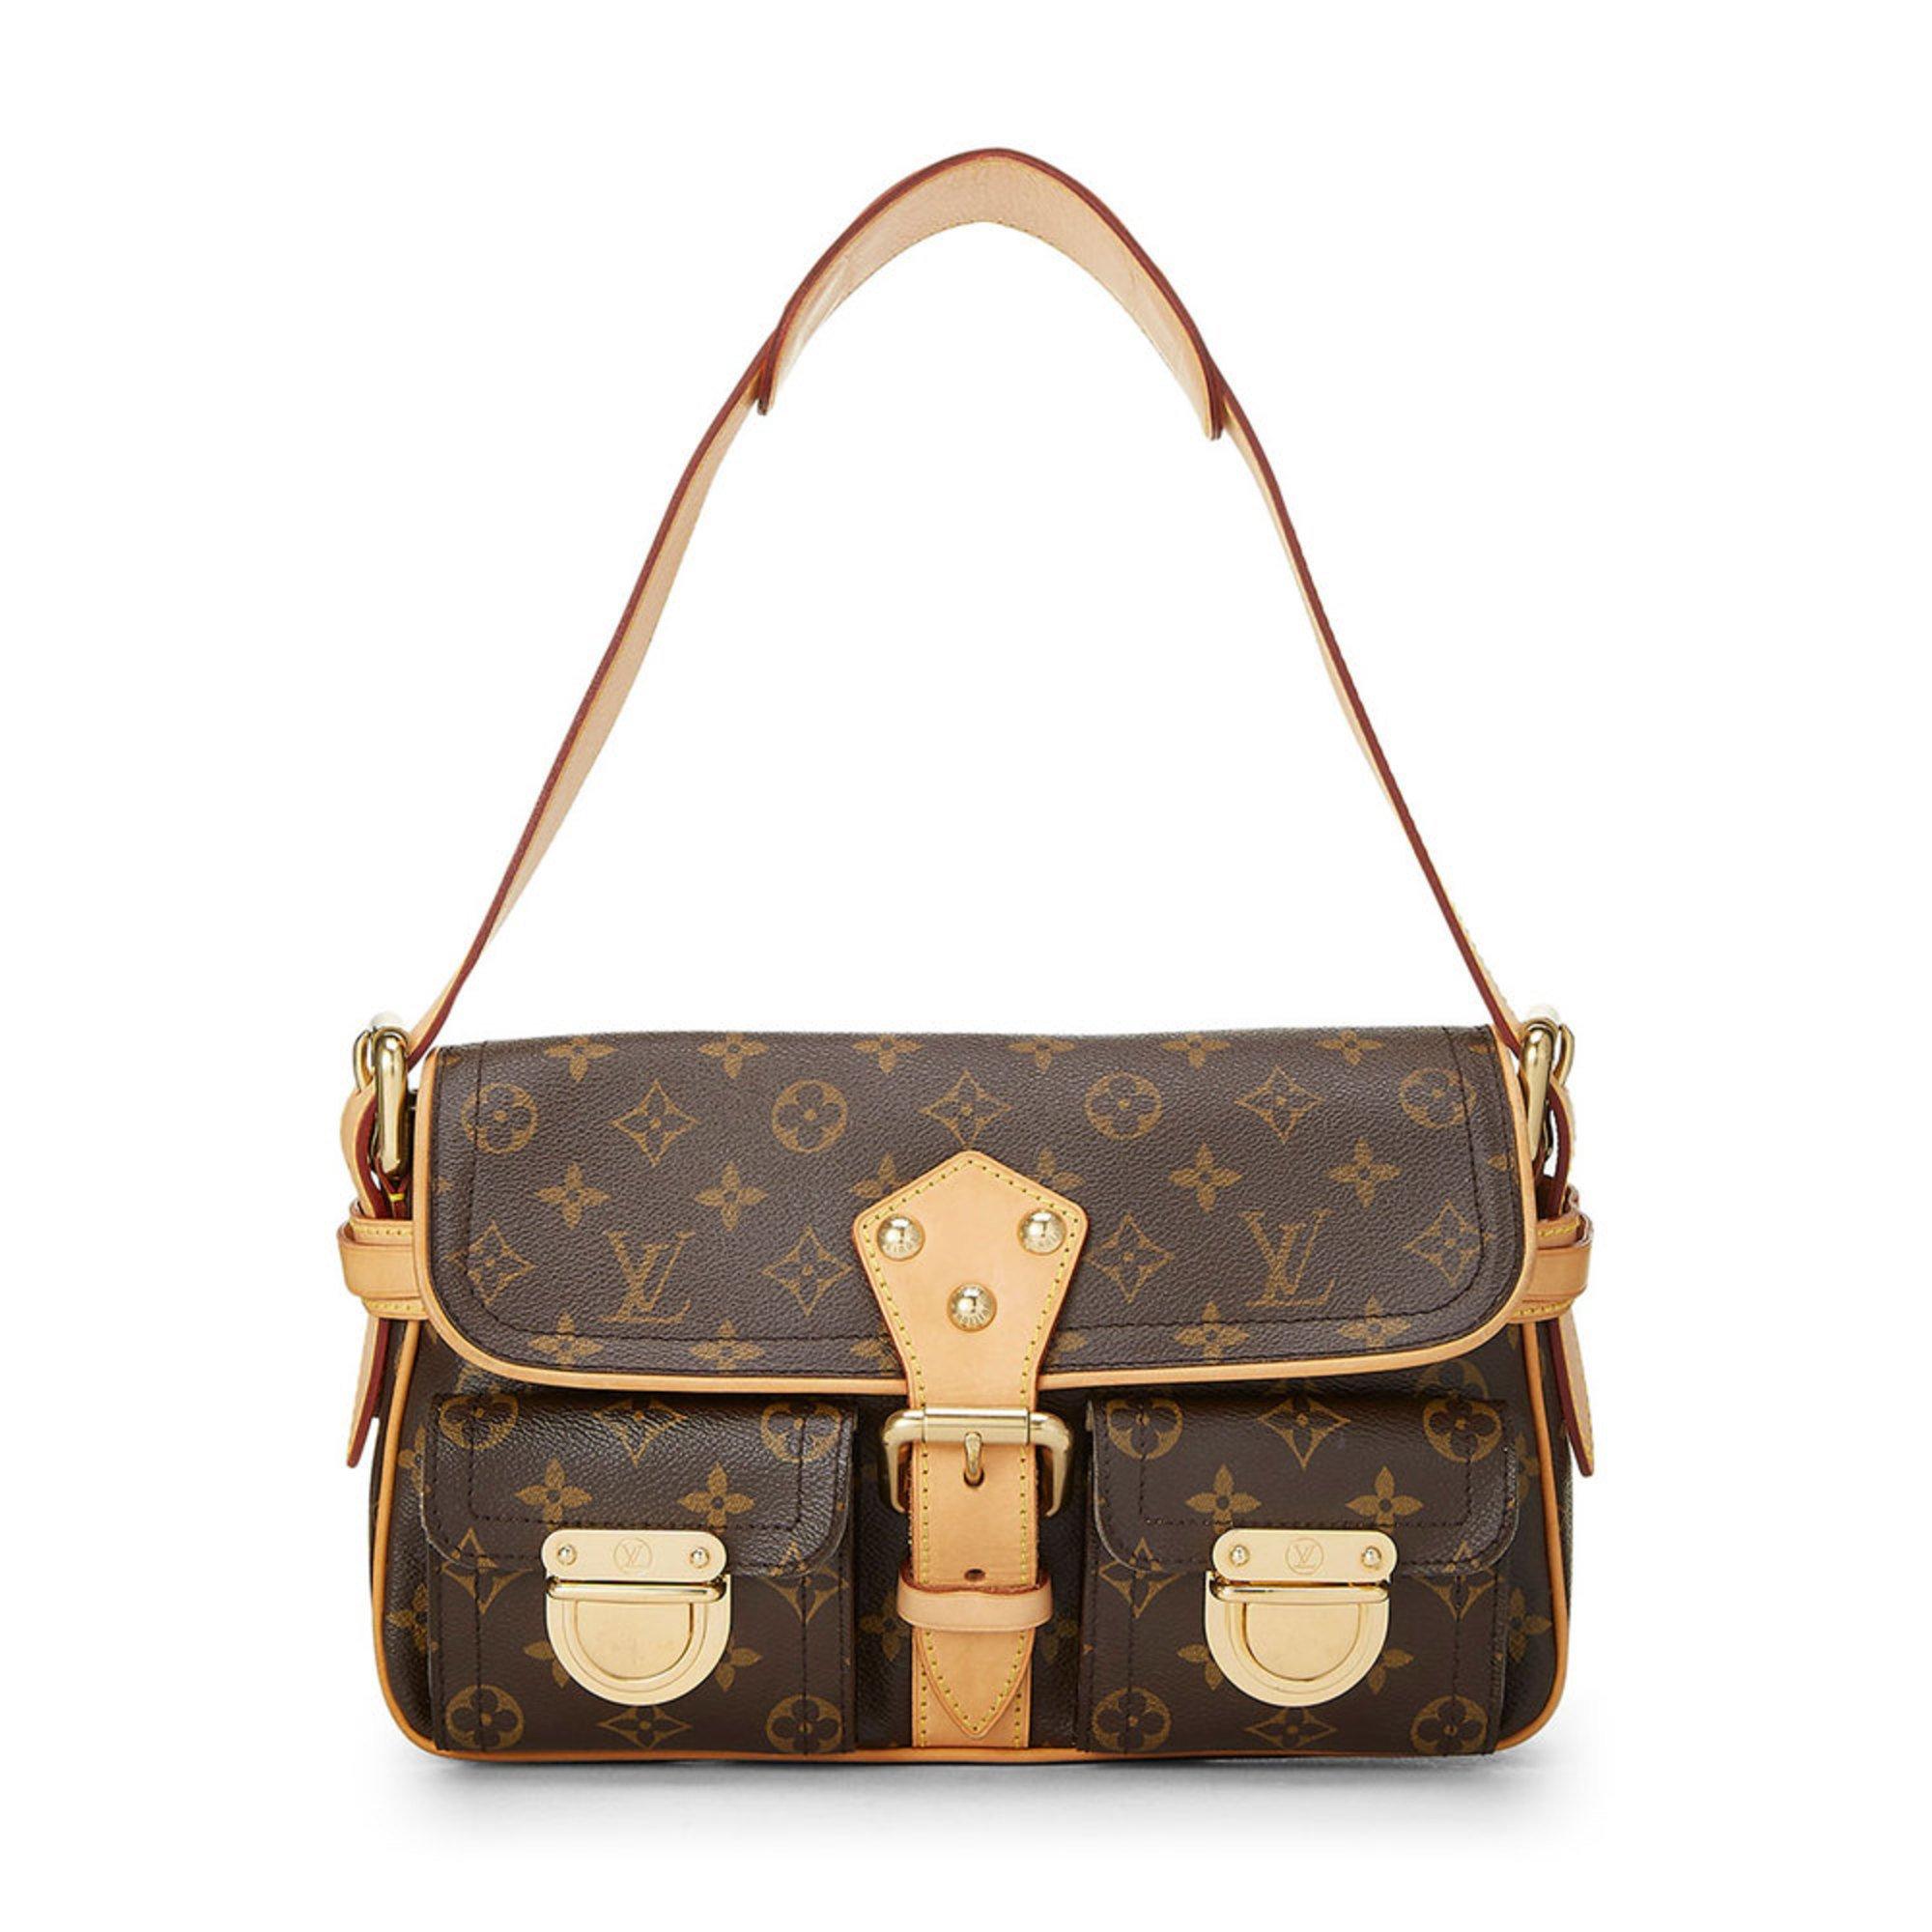 9dc3c9cf20 Louis Vuitton Monogram Hudson | Shoulder Bags | Handbags ...